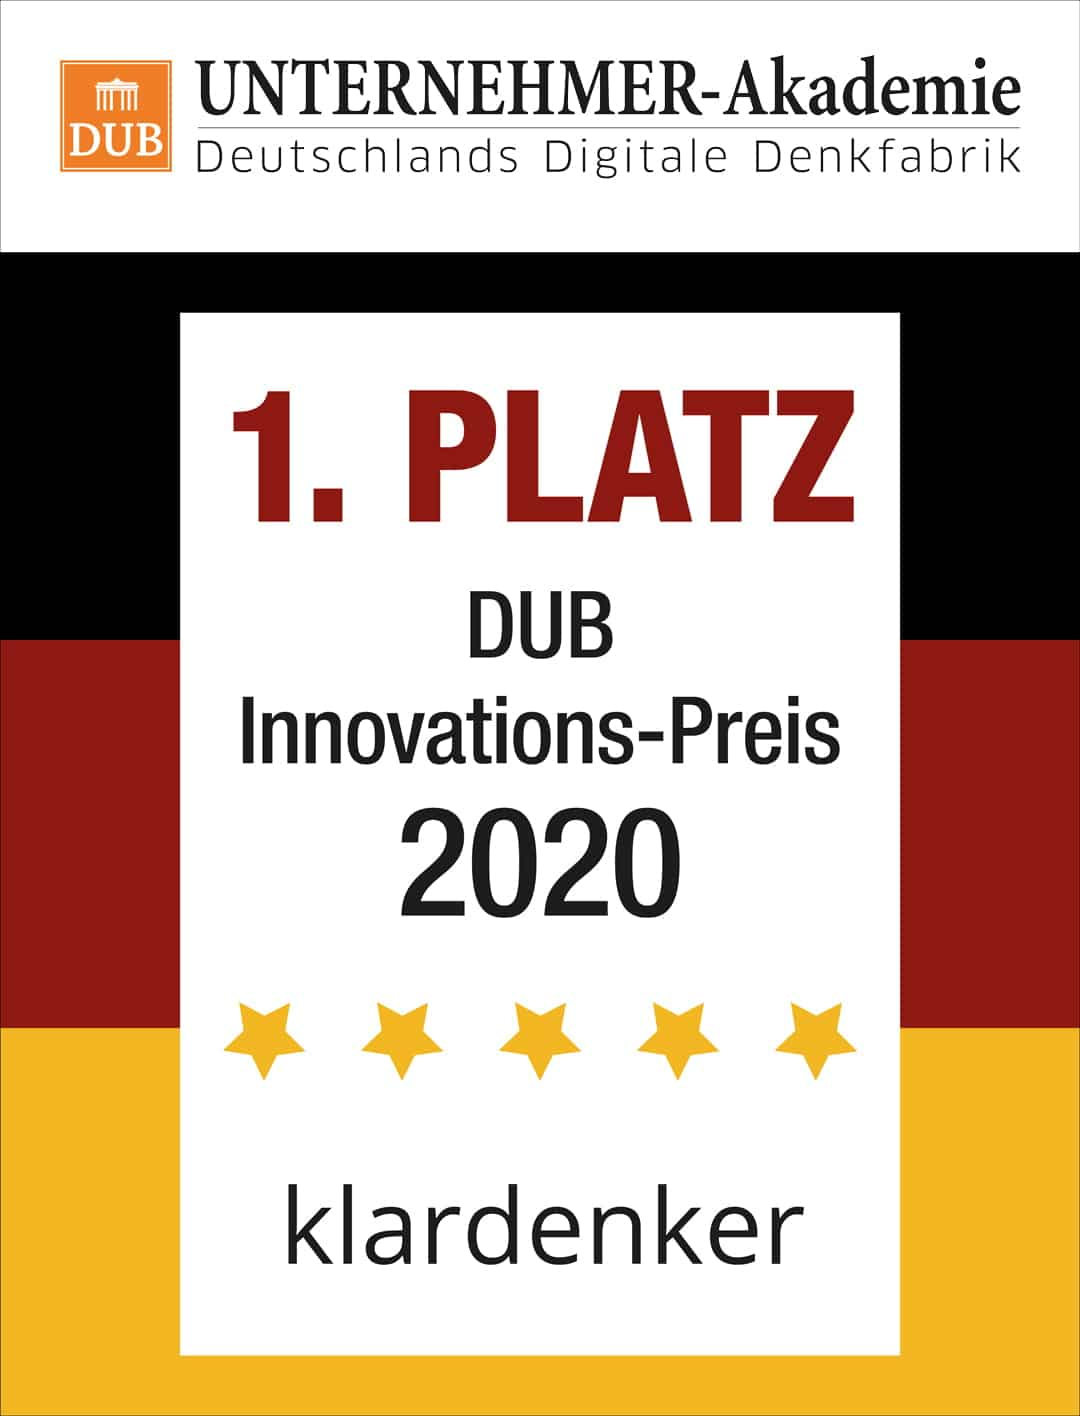 Innovationspreis-2020_klardenker